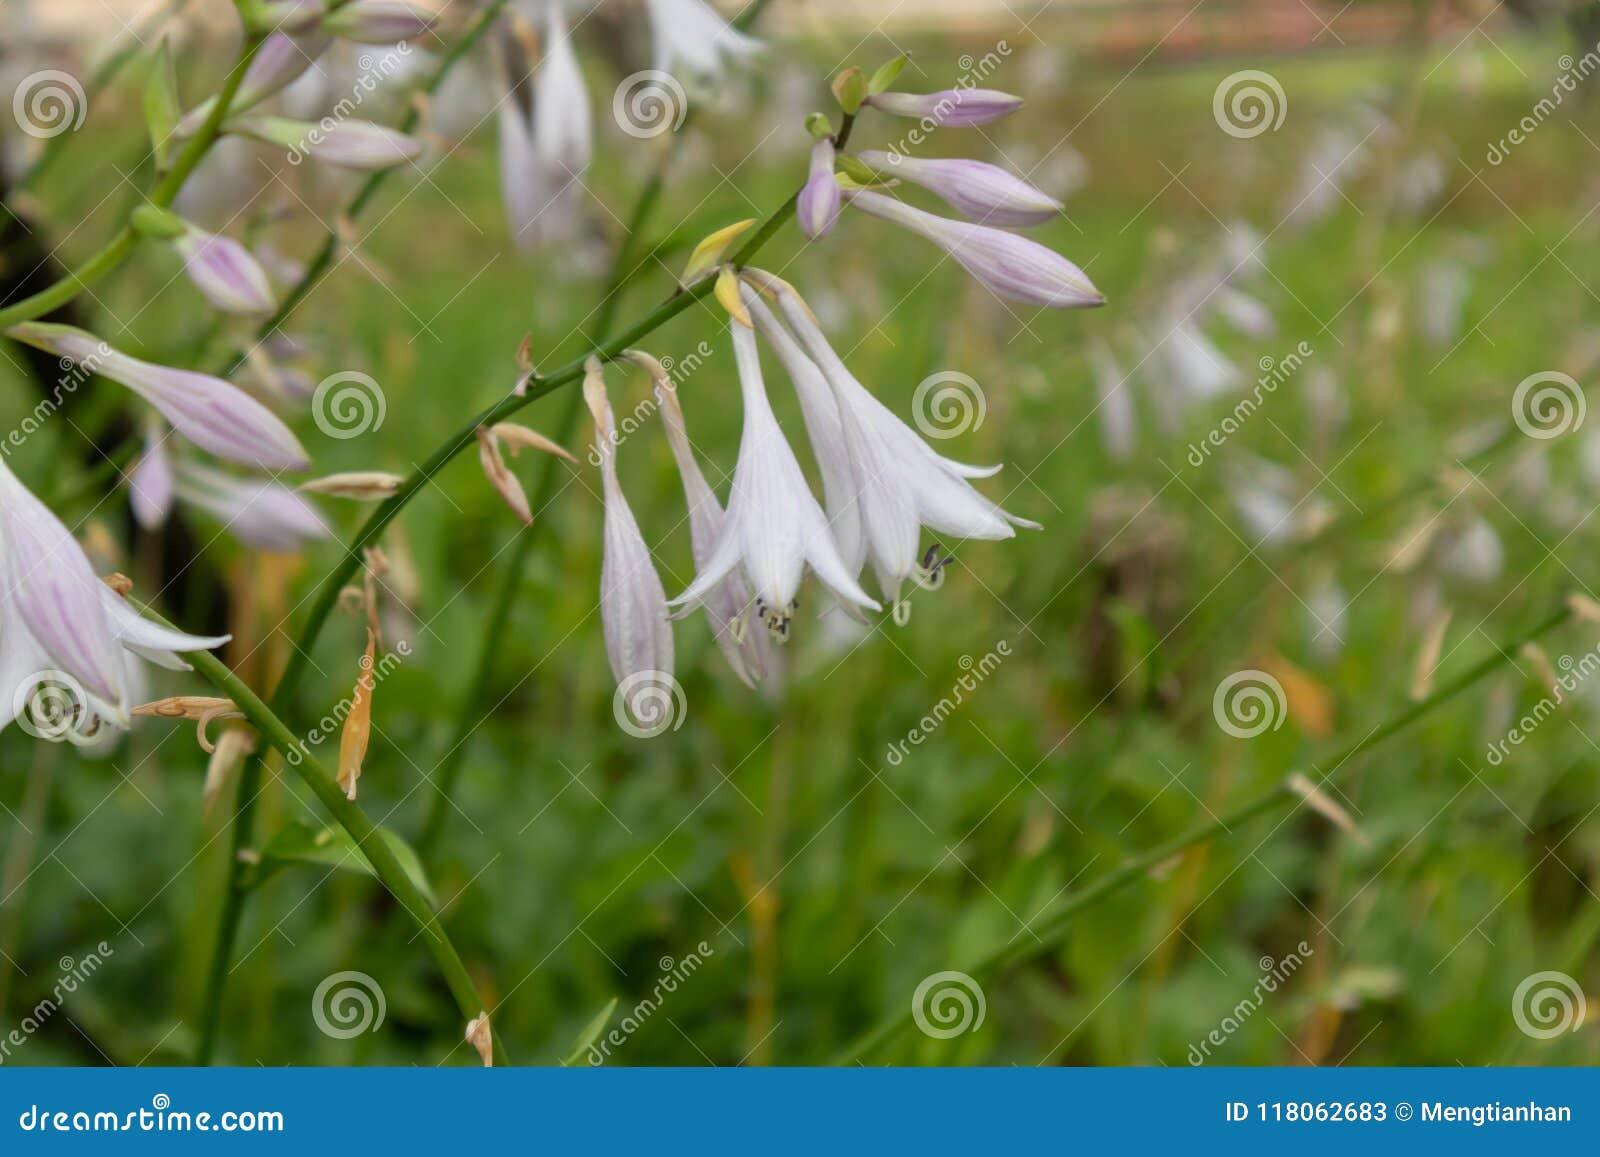 Flower Of Fragrant Plantain Lily Hosta Plantaginea Lam Aschers